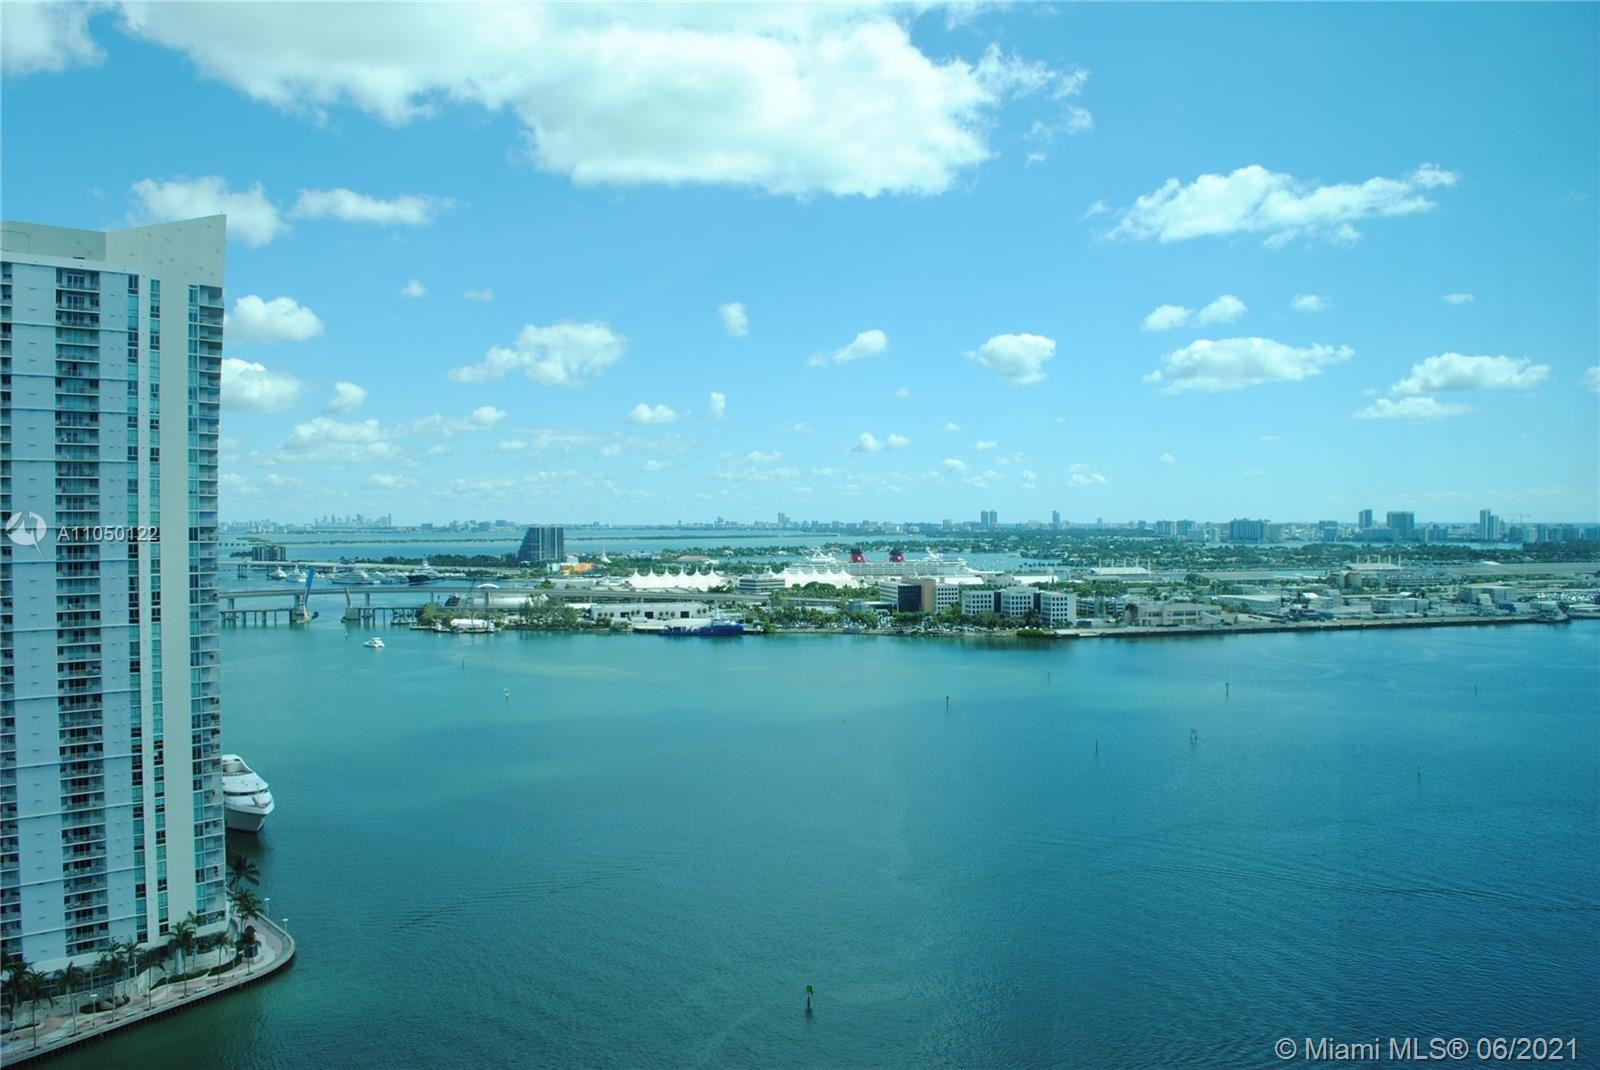 900 Brickell Key Blvd #2302, Miami, FL 33131 - #: A11050122